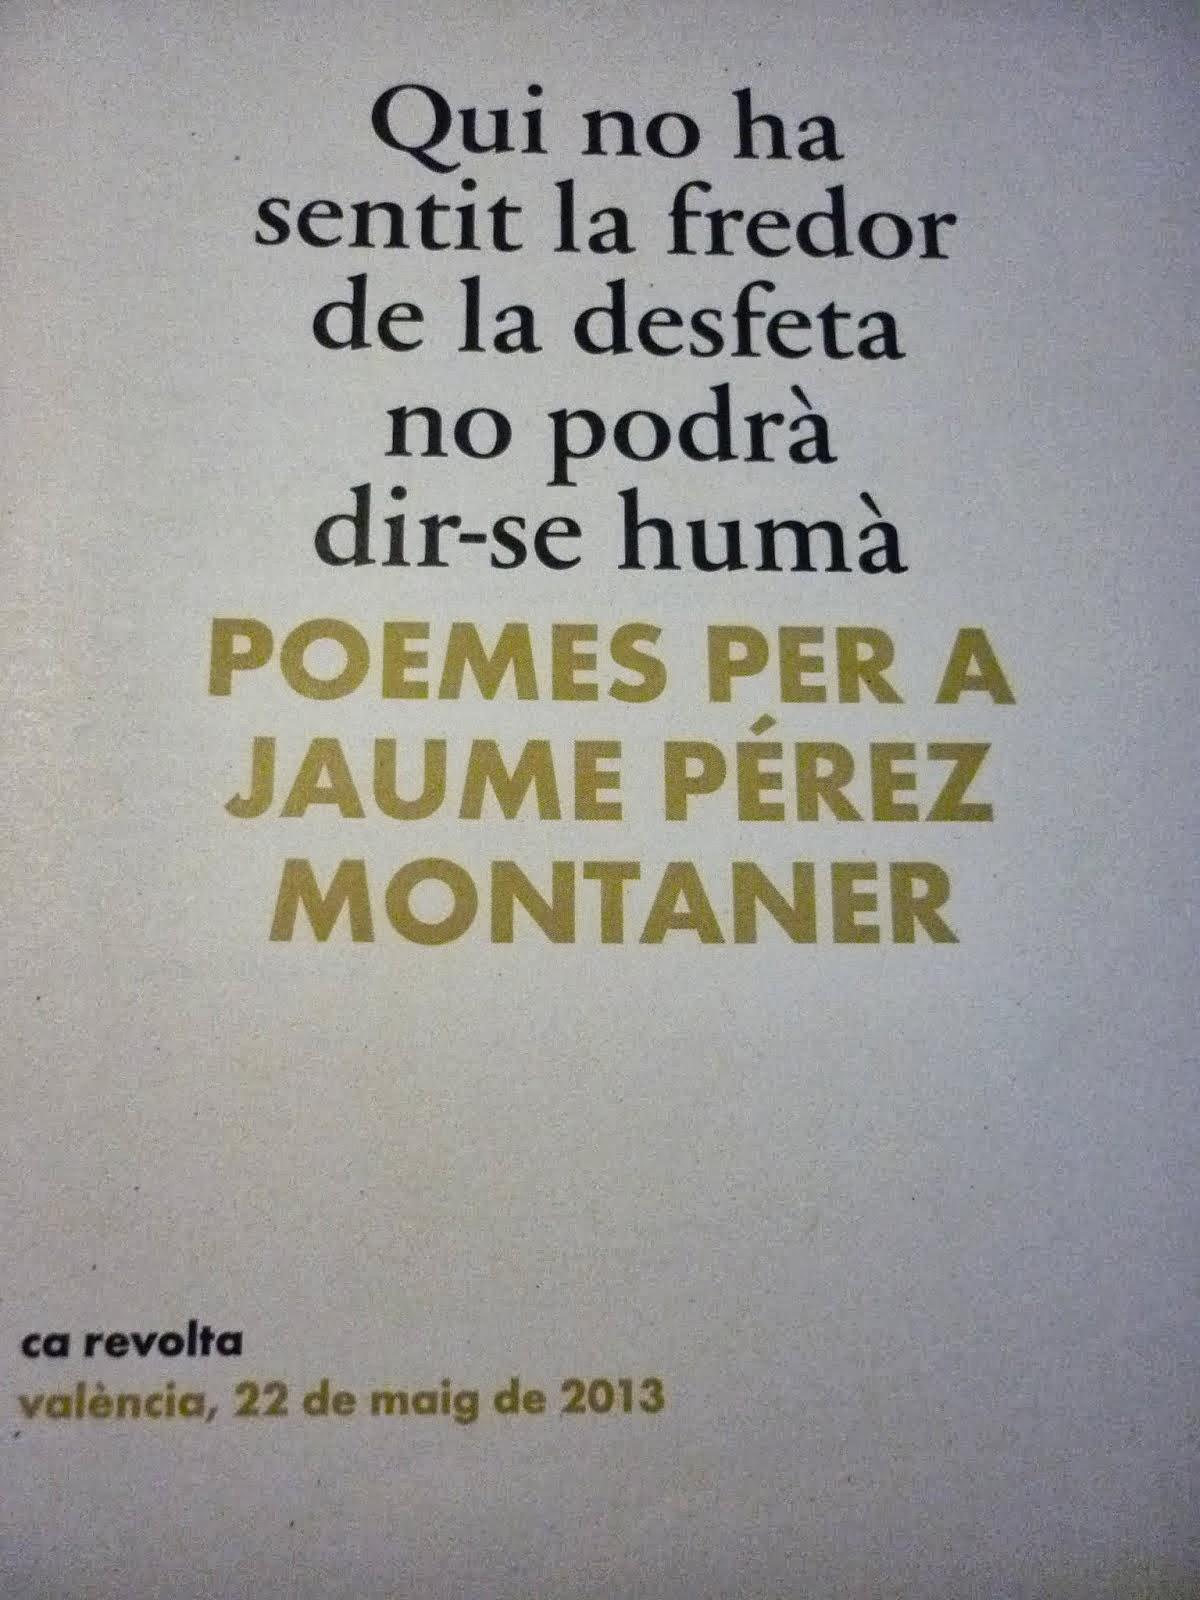 Plaquette Homenatge Ca Revolta